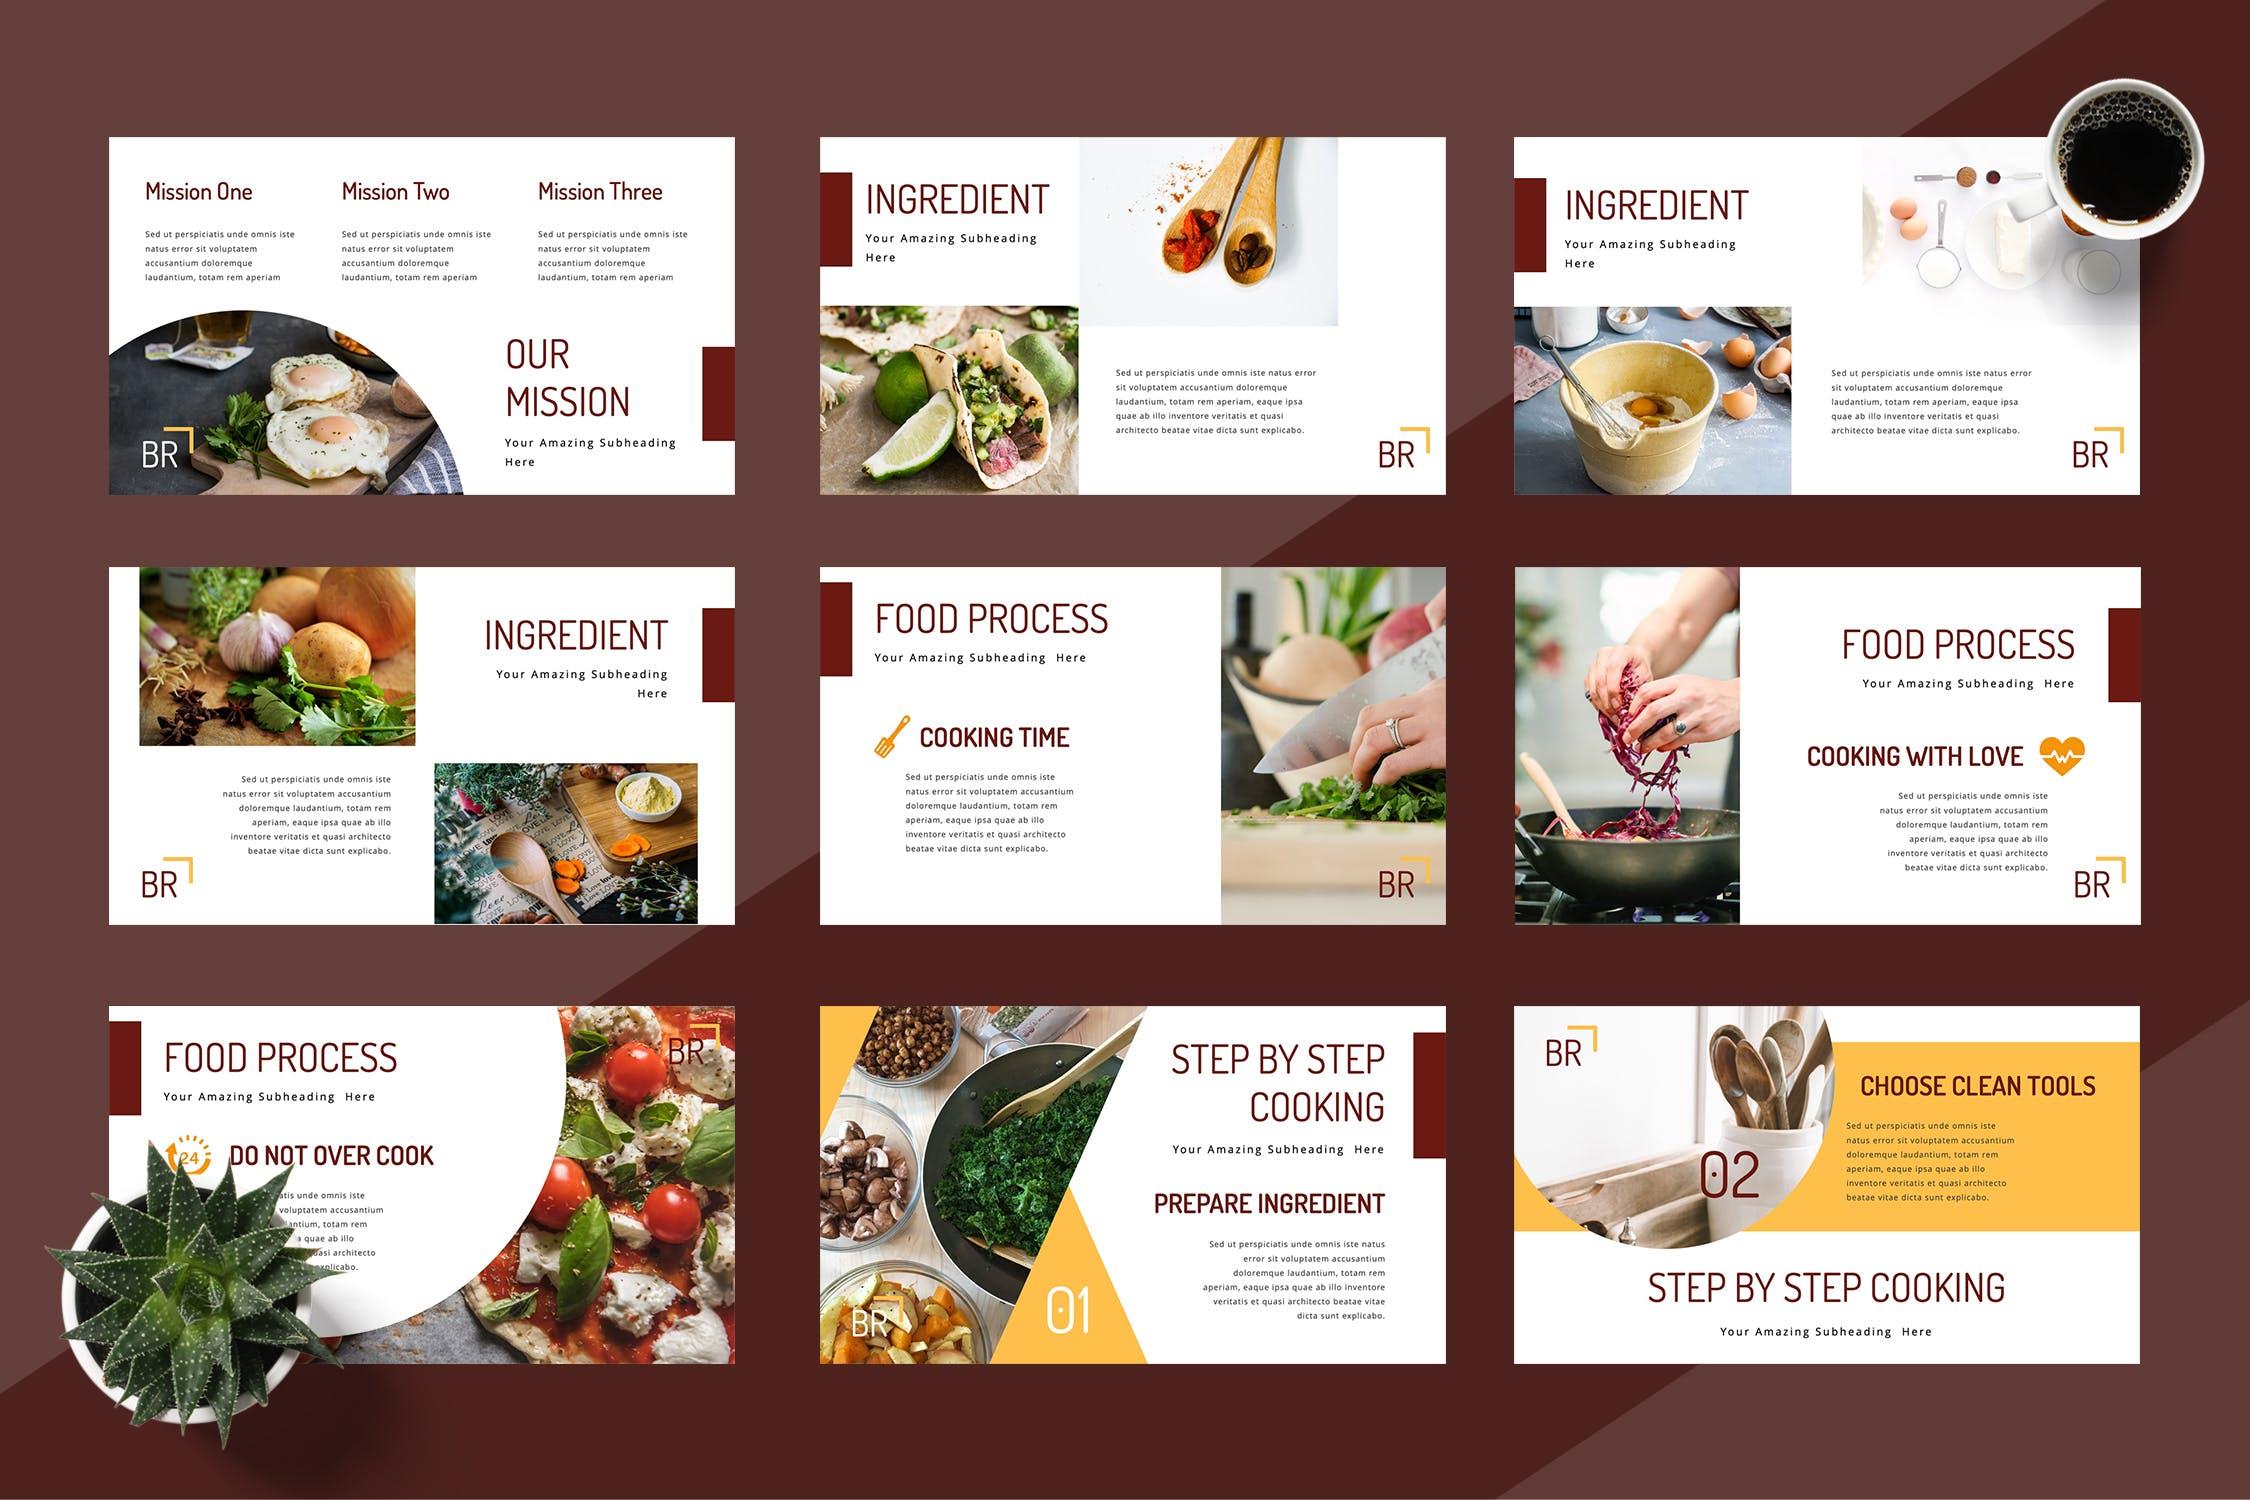 早餐-食物美食类展示模板Breakfa Food Powerpoint Presentation插图(2)